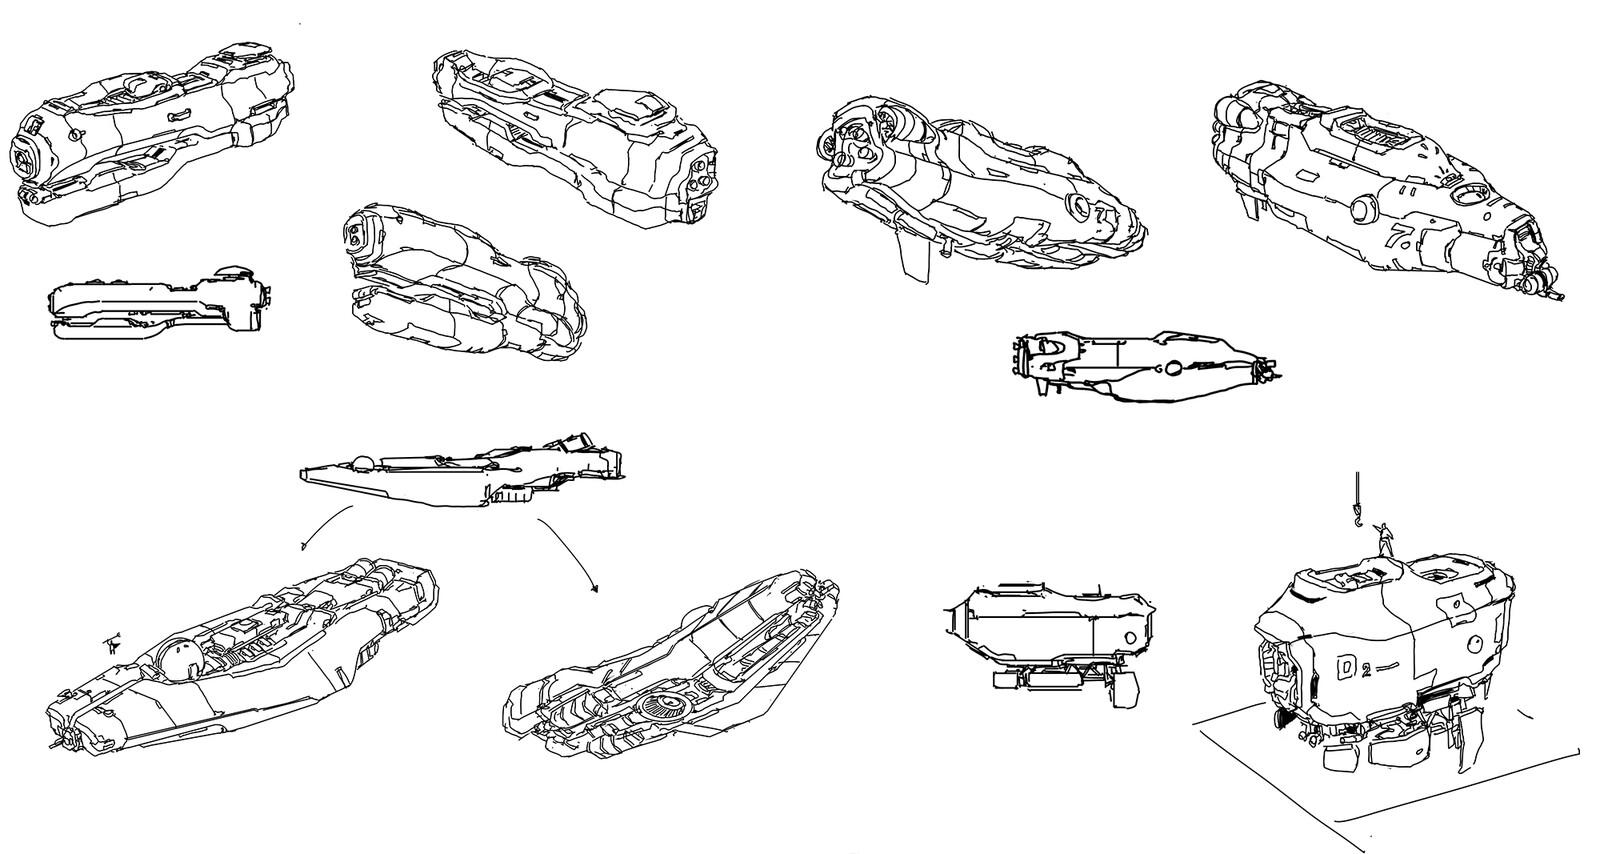 random ship doodle 1